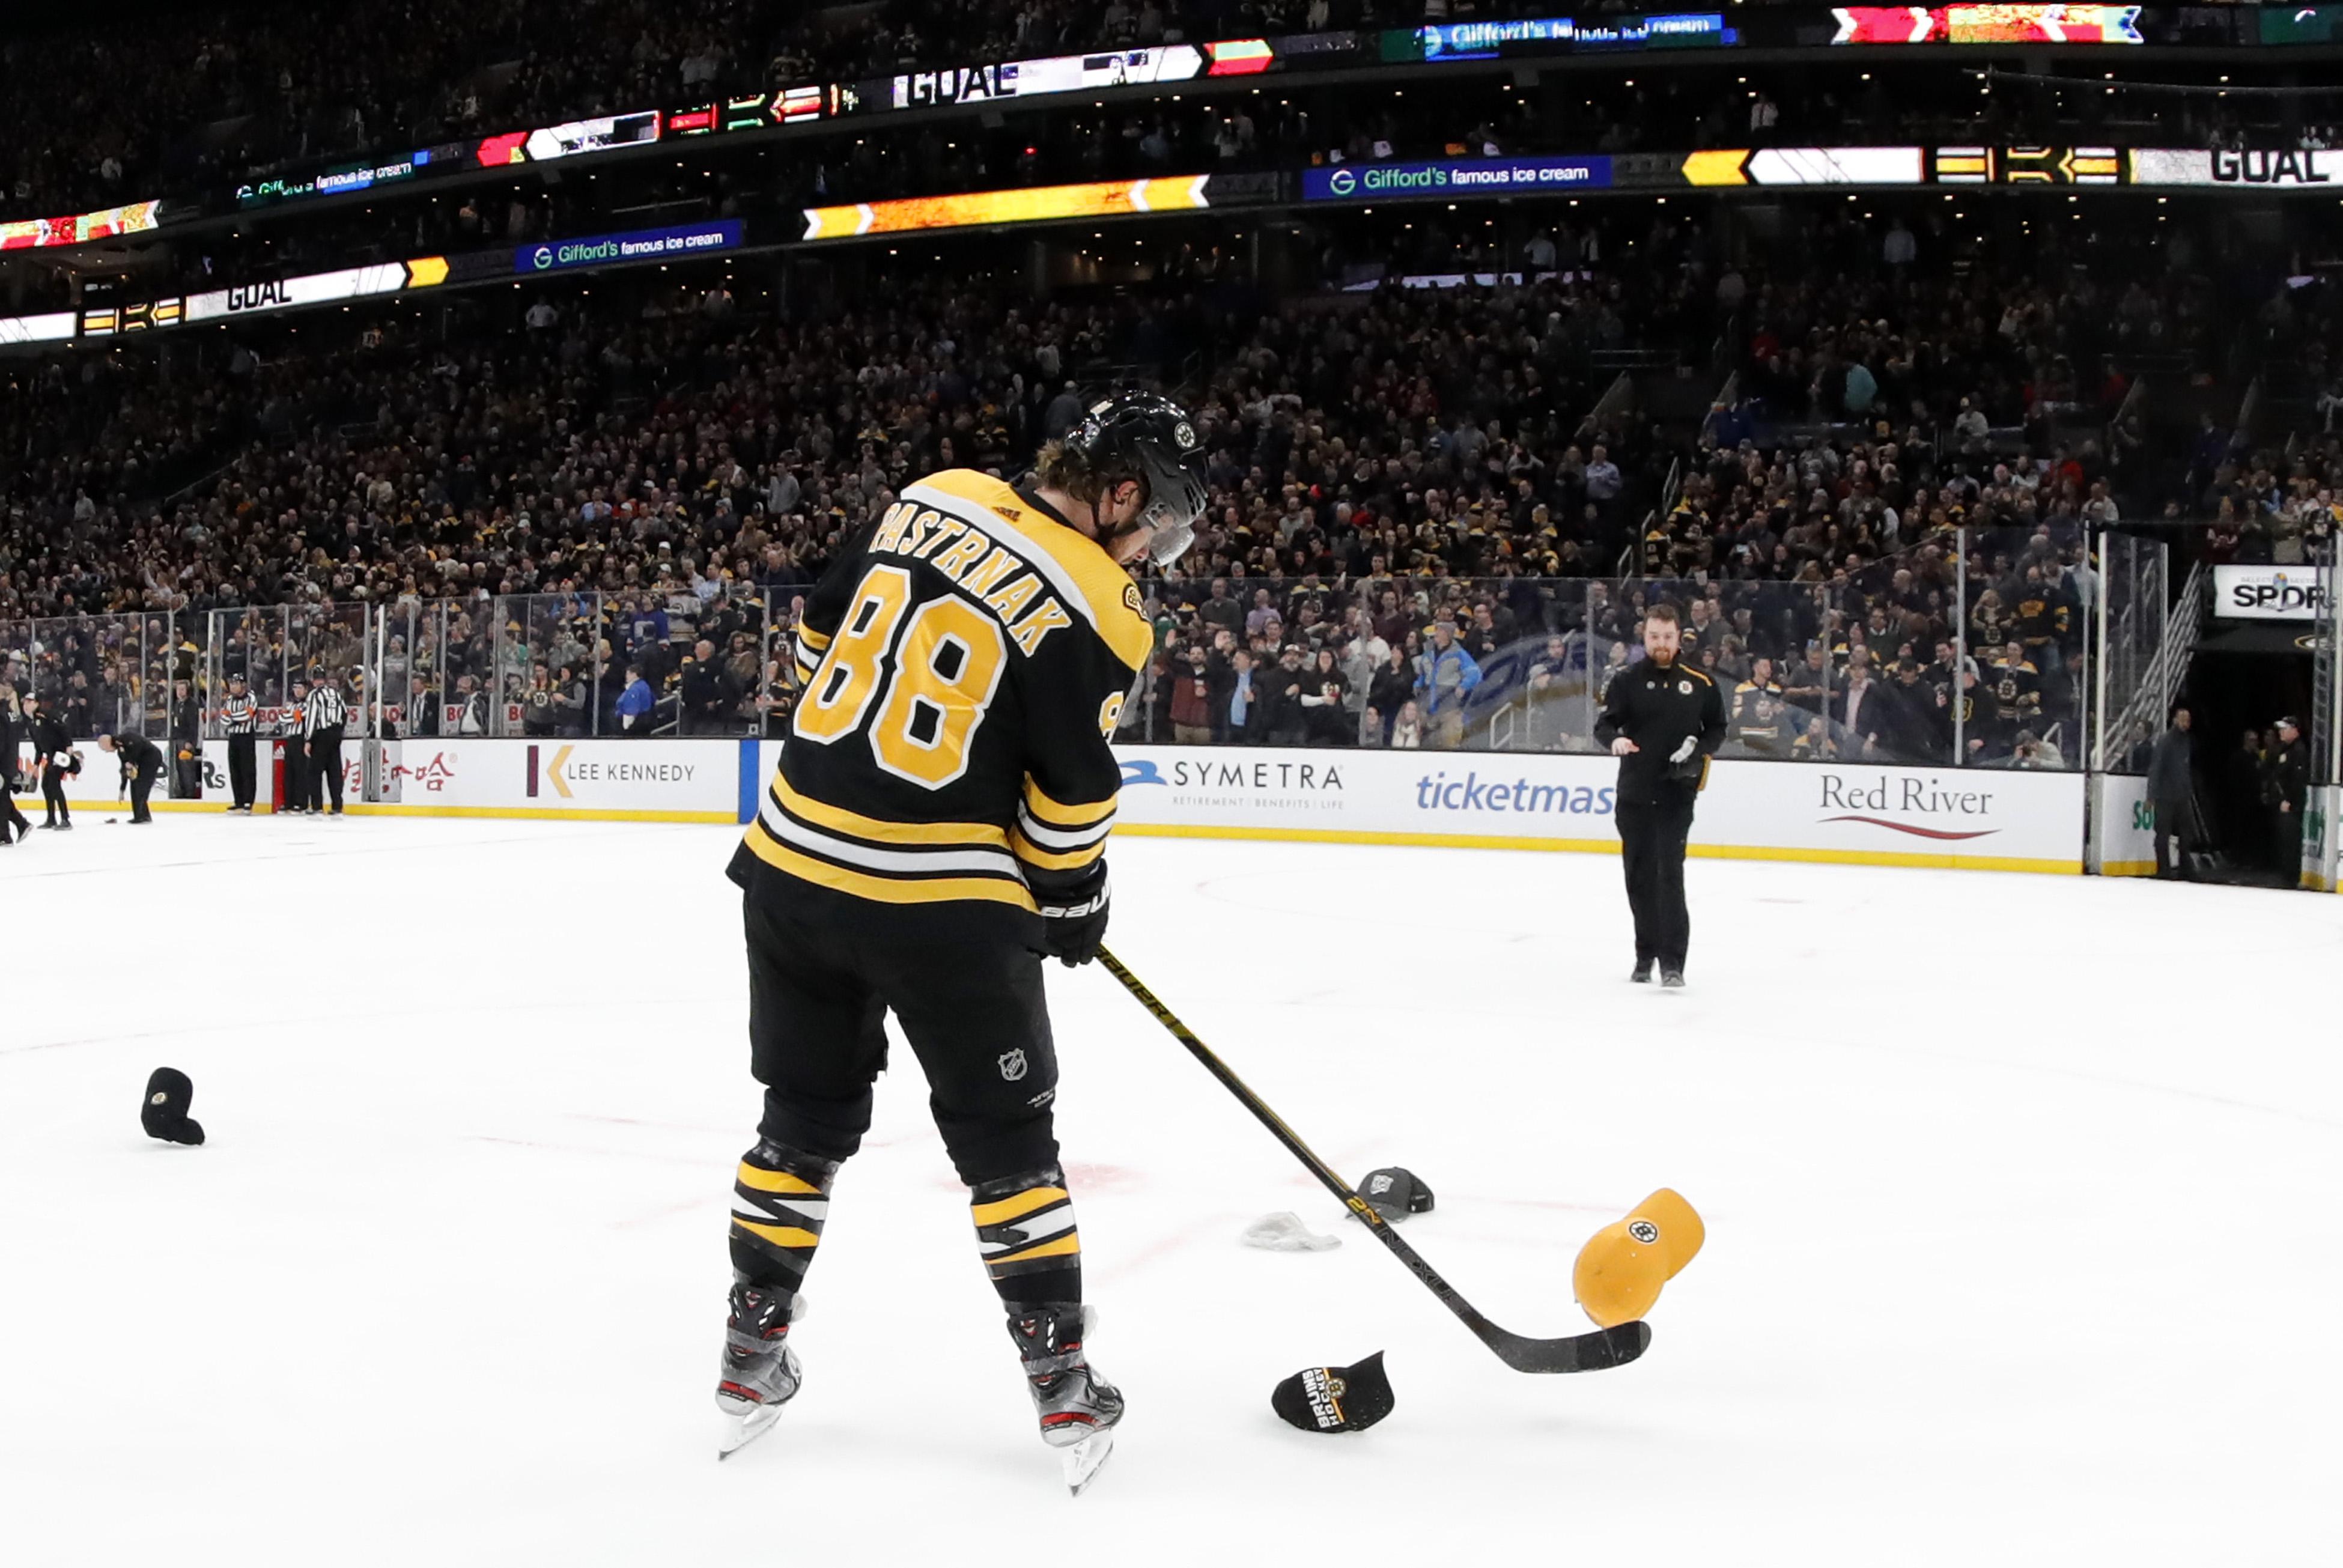 NHL: FEB 12 Canadiens at Bruins